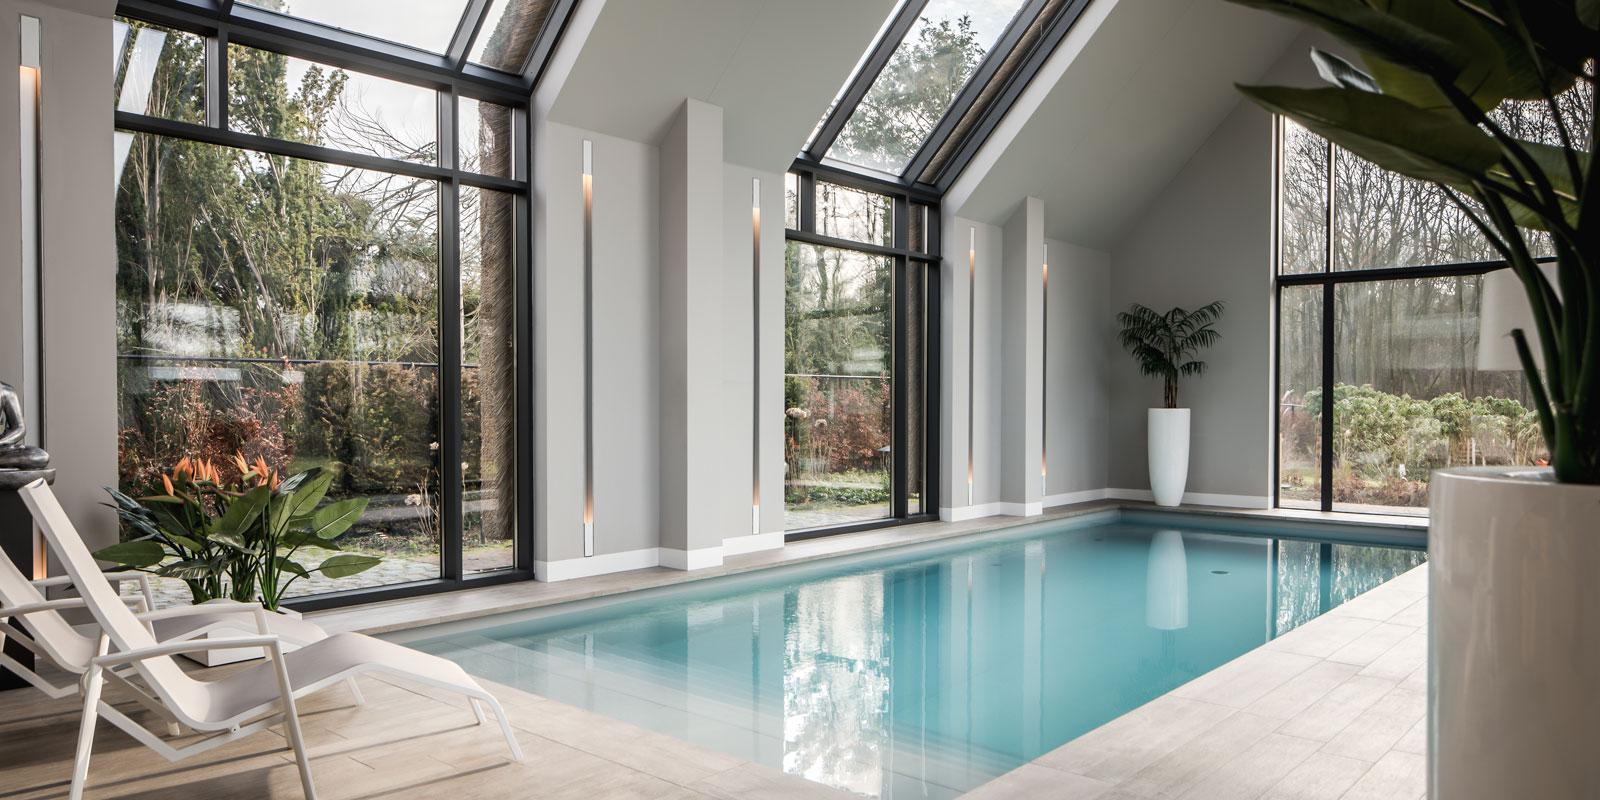 binnenzwembad, VSB Wellness, thuis zwembad, luxe, Drijvers, villa